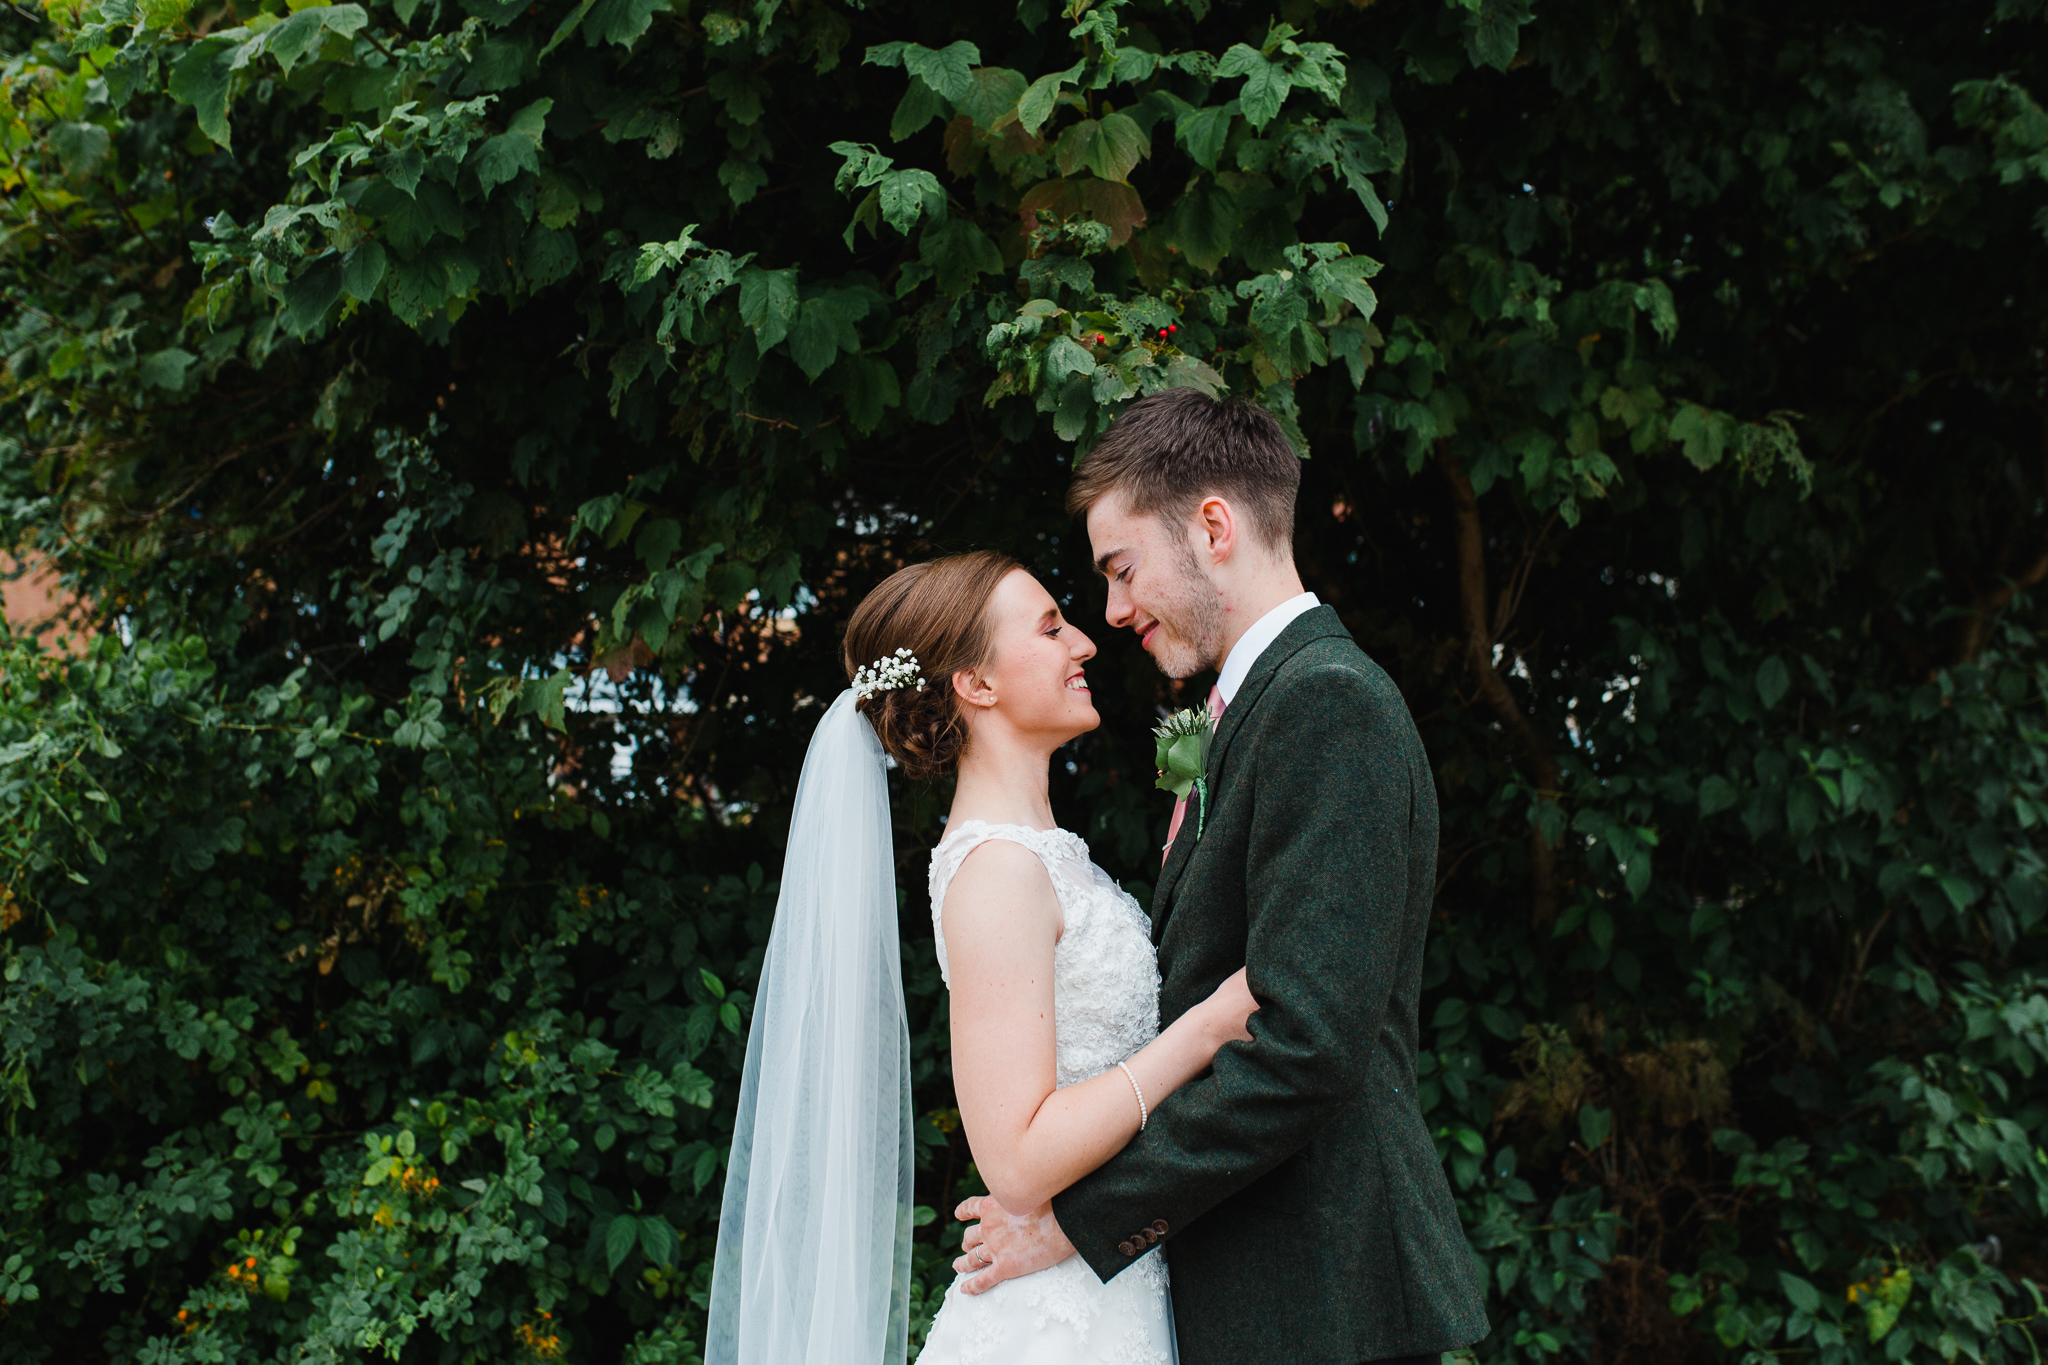 Jess and Ben - Liverpool wedding - bride and groom embracing